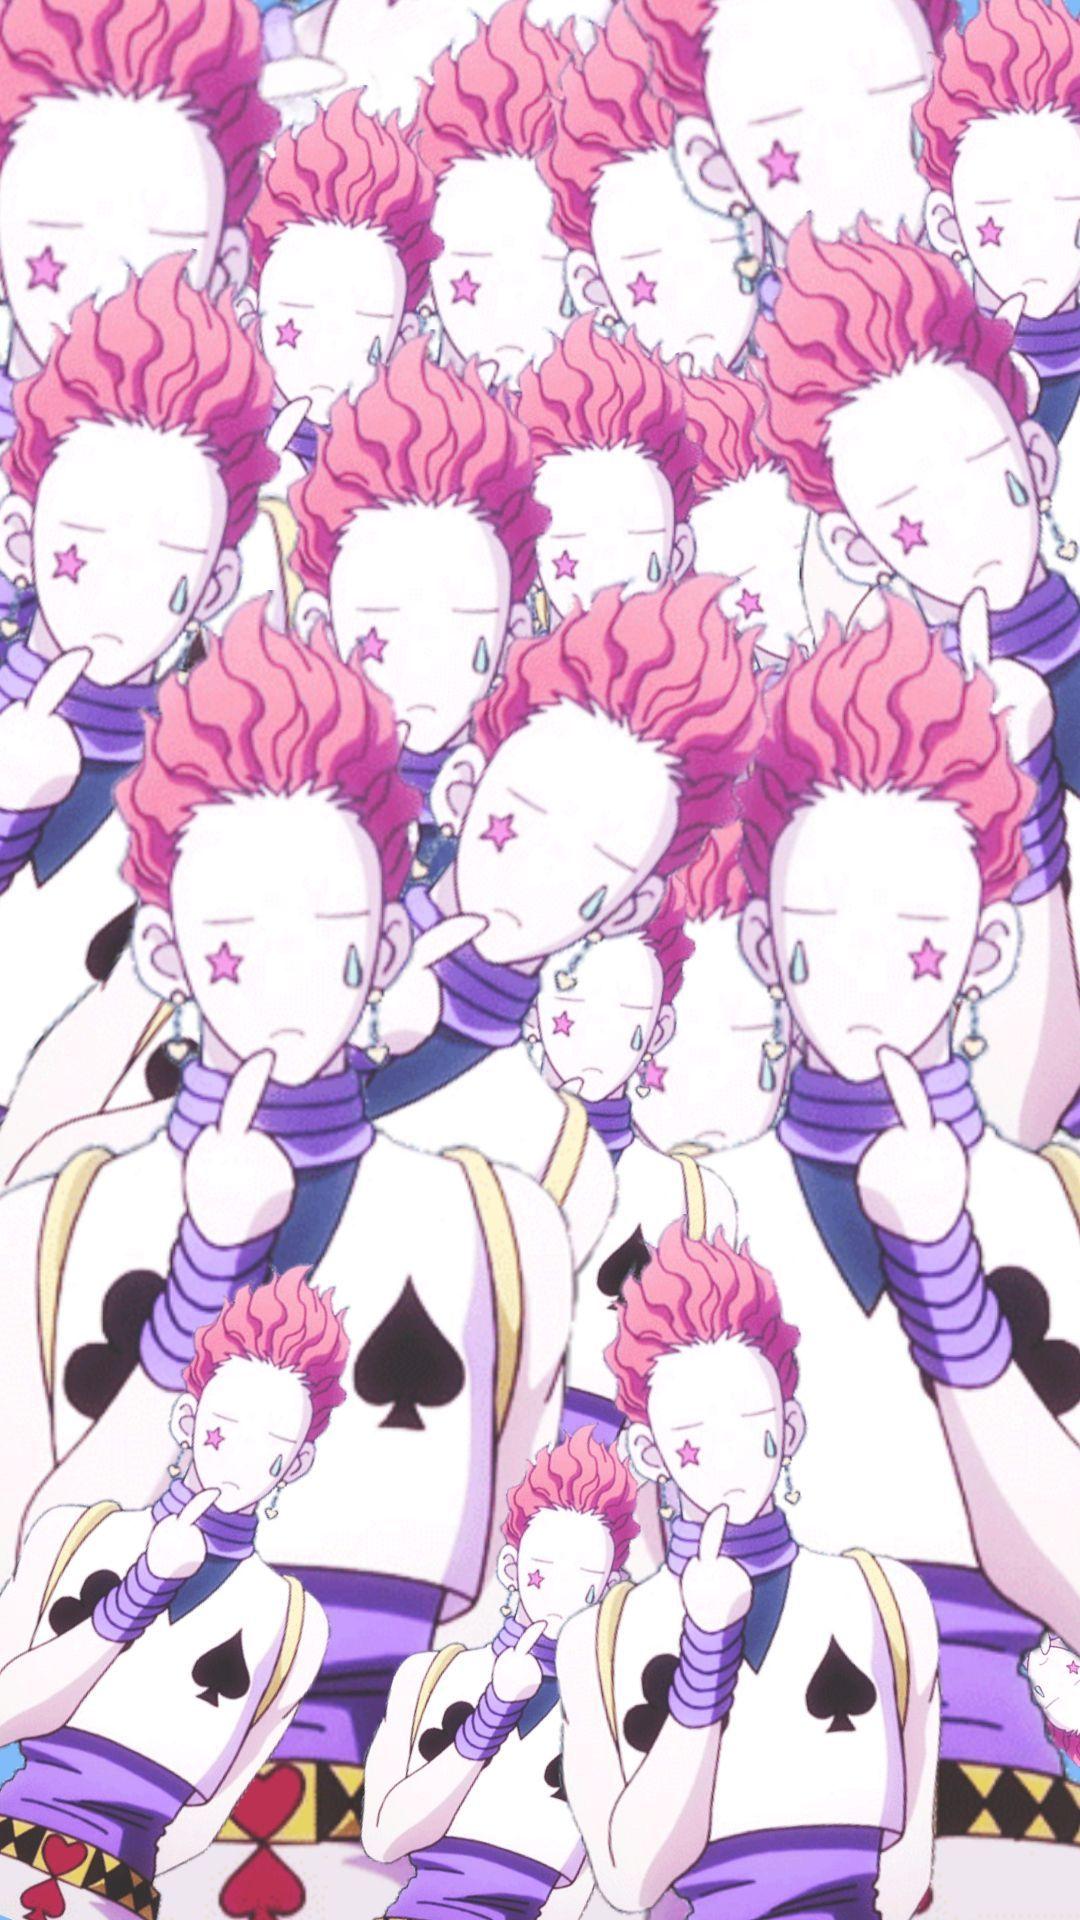 ᶠᵒⁿᵈᵒˢ ᵈᵉ ᵖᵃⁿᵗᵃˡˡᵃ Hunter Anime Hunter X Hunter Anime